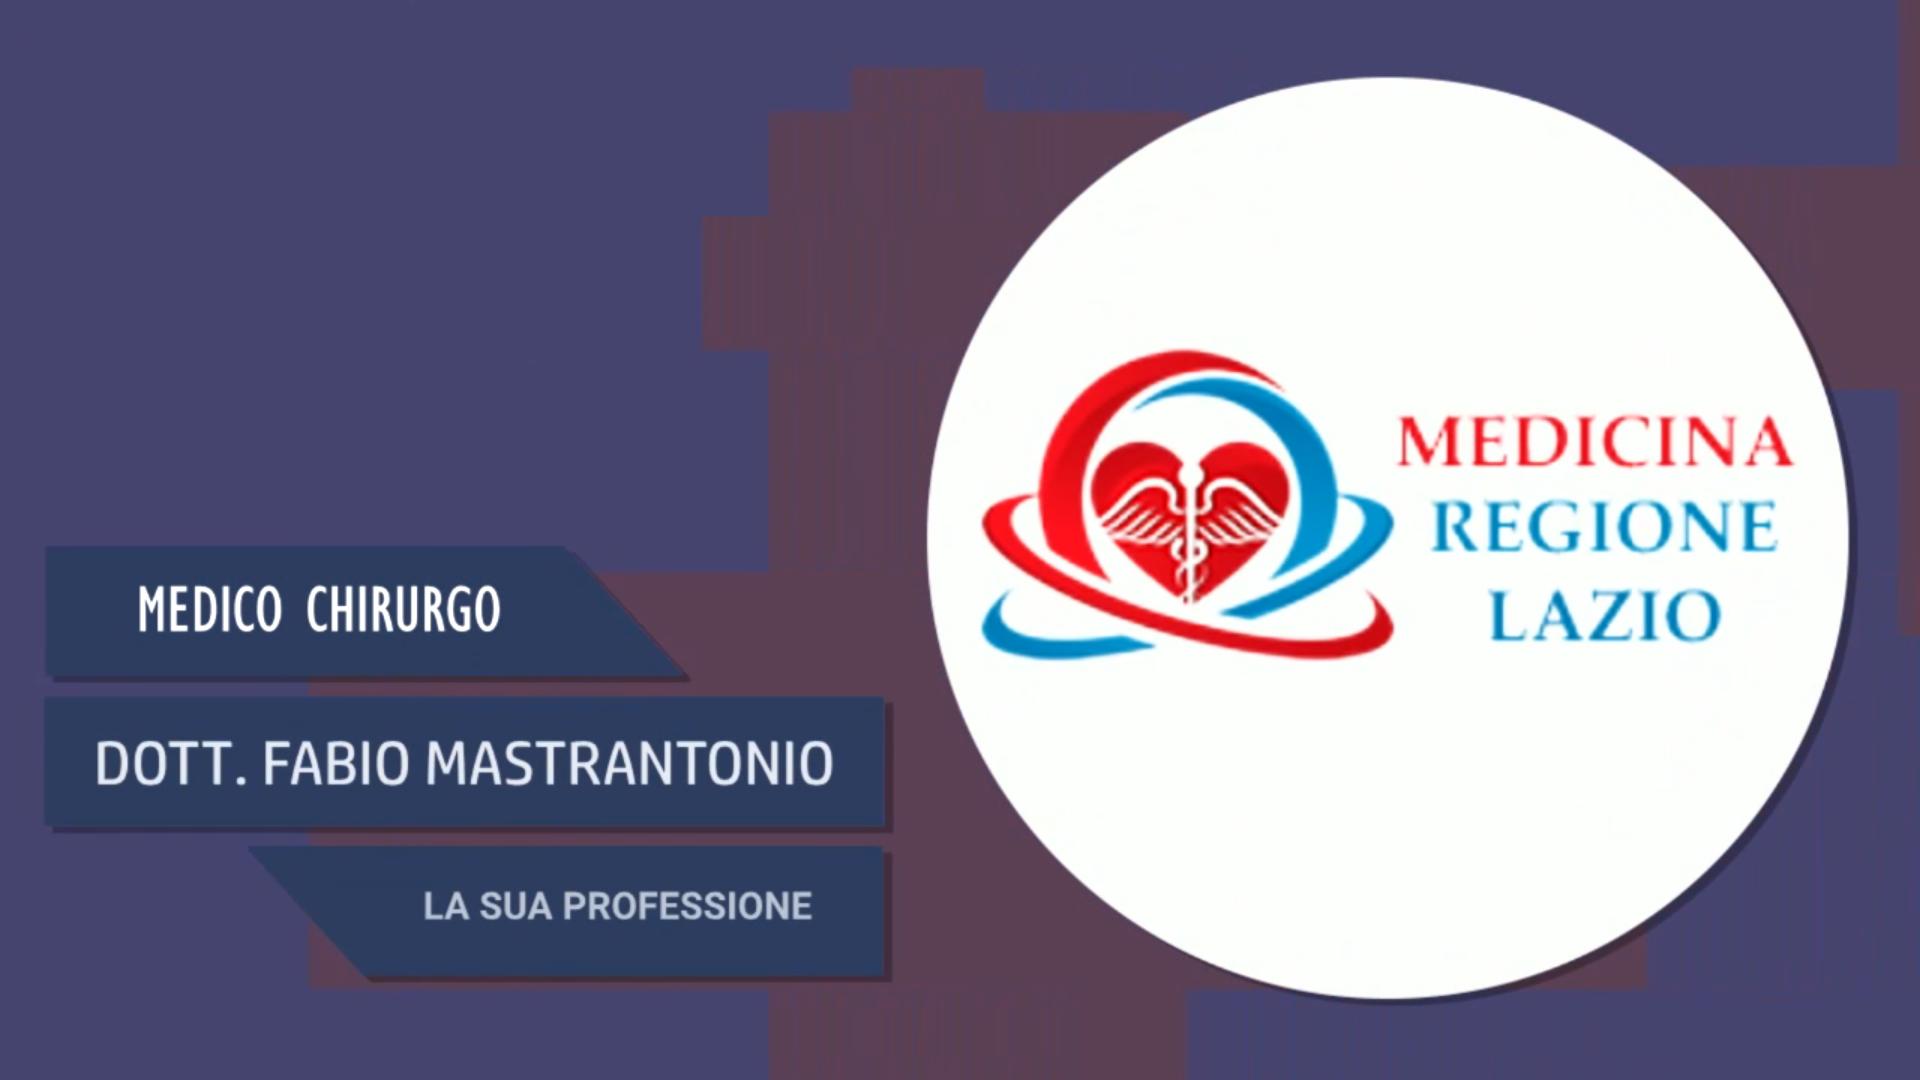 Intervista al Dott. Fabio Mastrantonio – la sua professione